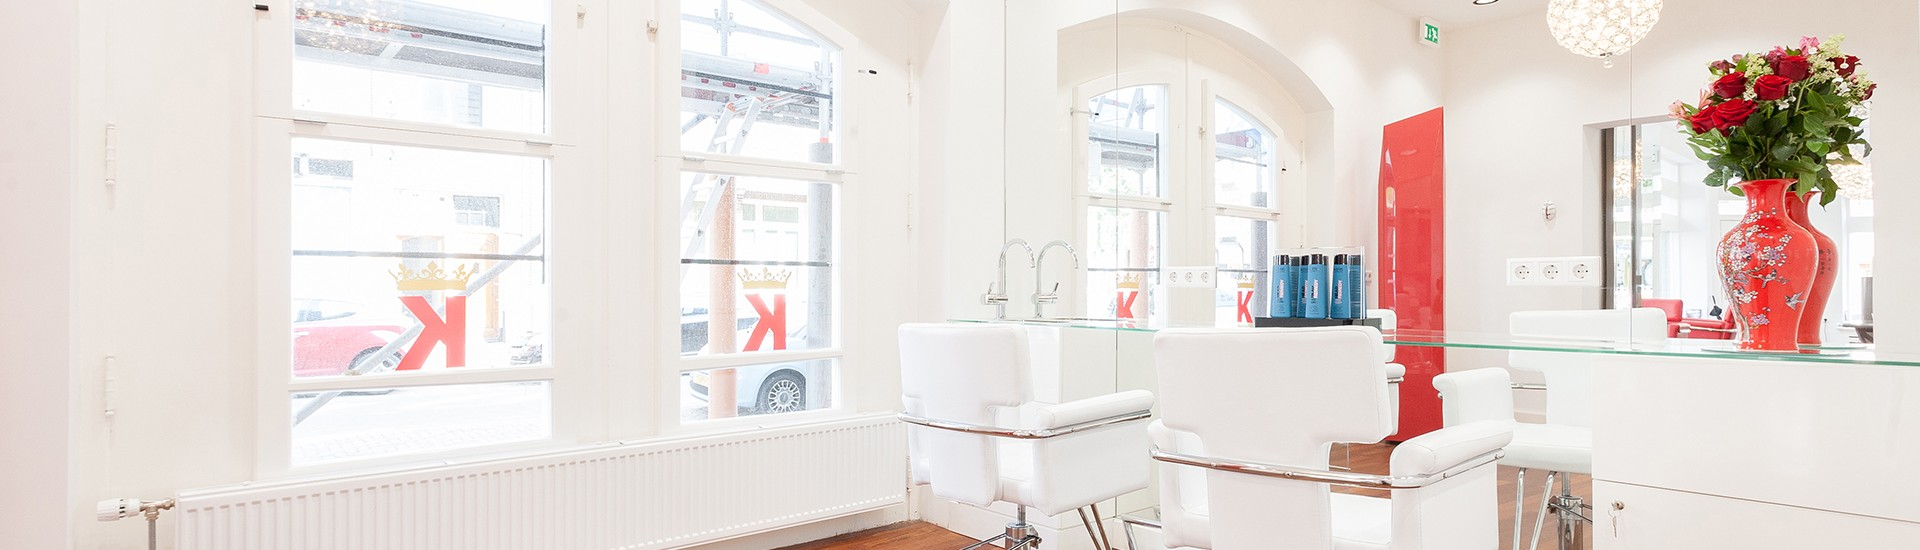 Kbal-hairstylist-Kapsalon-Amsterdam-interieur03